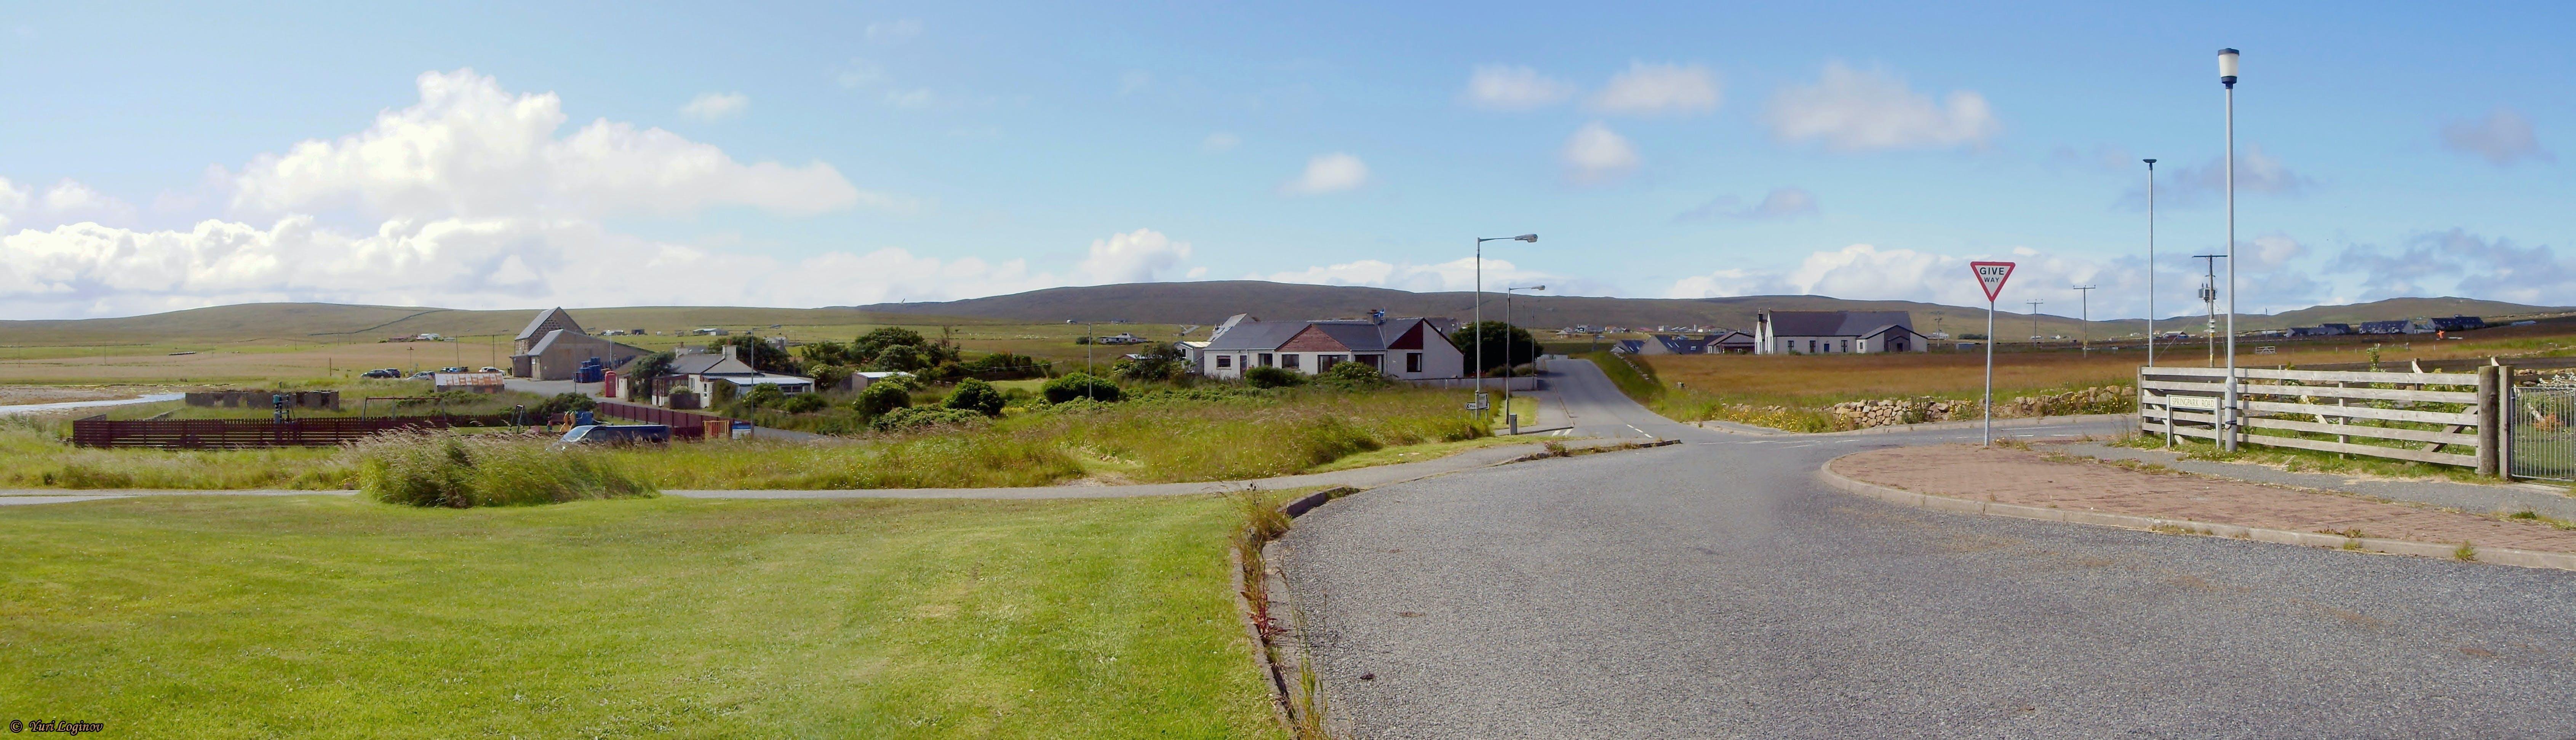 Free stock photo of Baltasound, scotland, Shetland, Shetland Islands